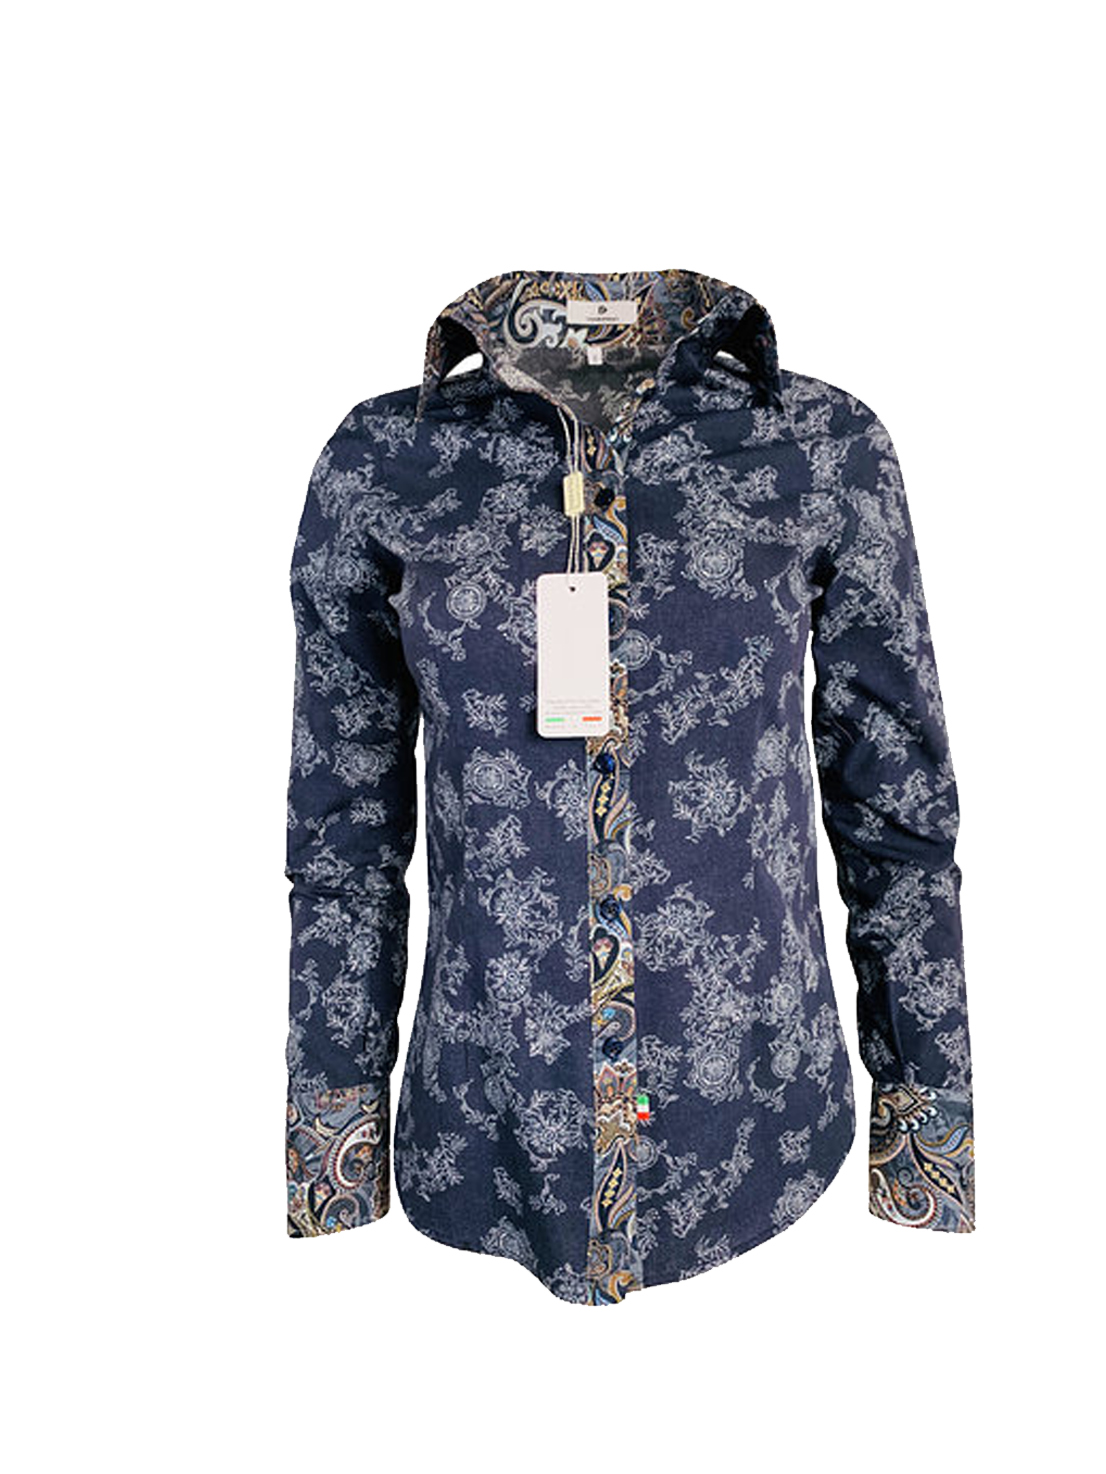 Allegro motif jeans et fantaisie bleu marine. Chemise italienne